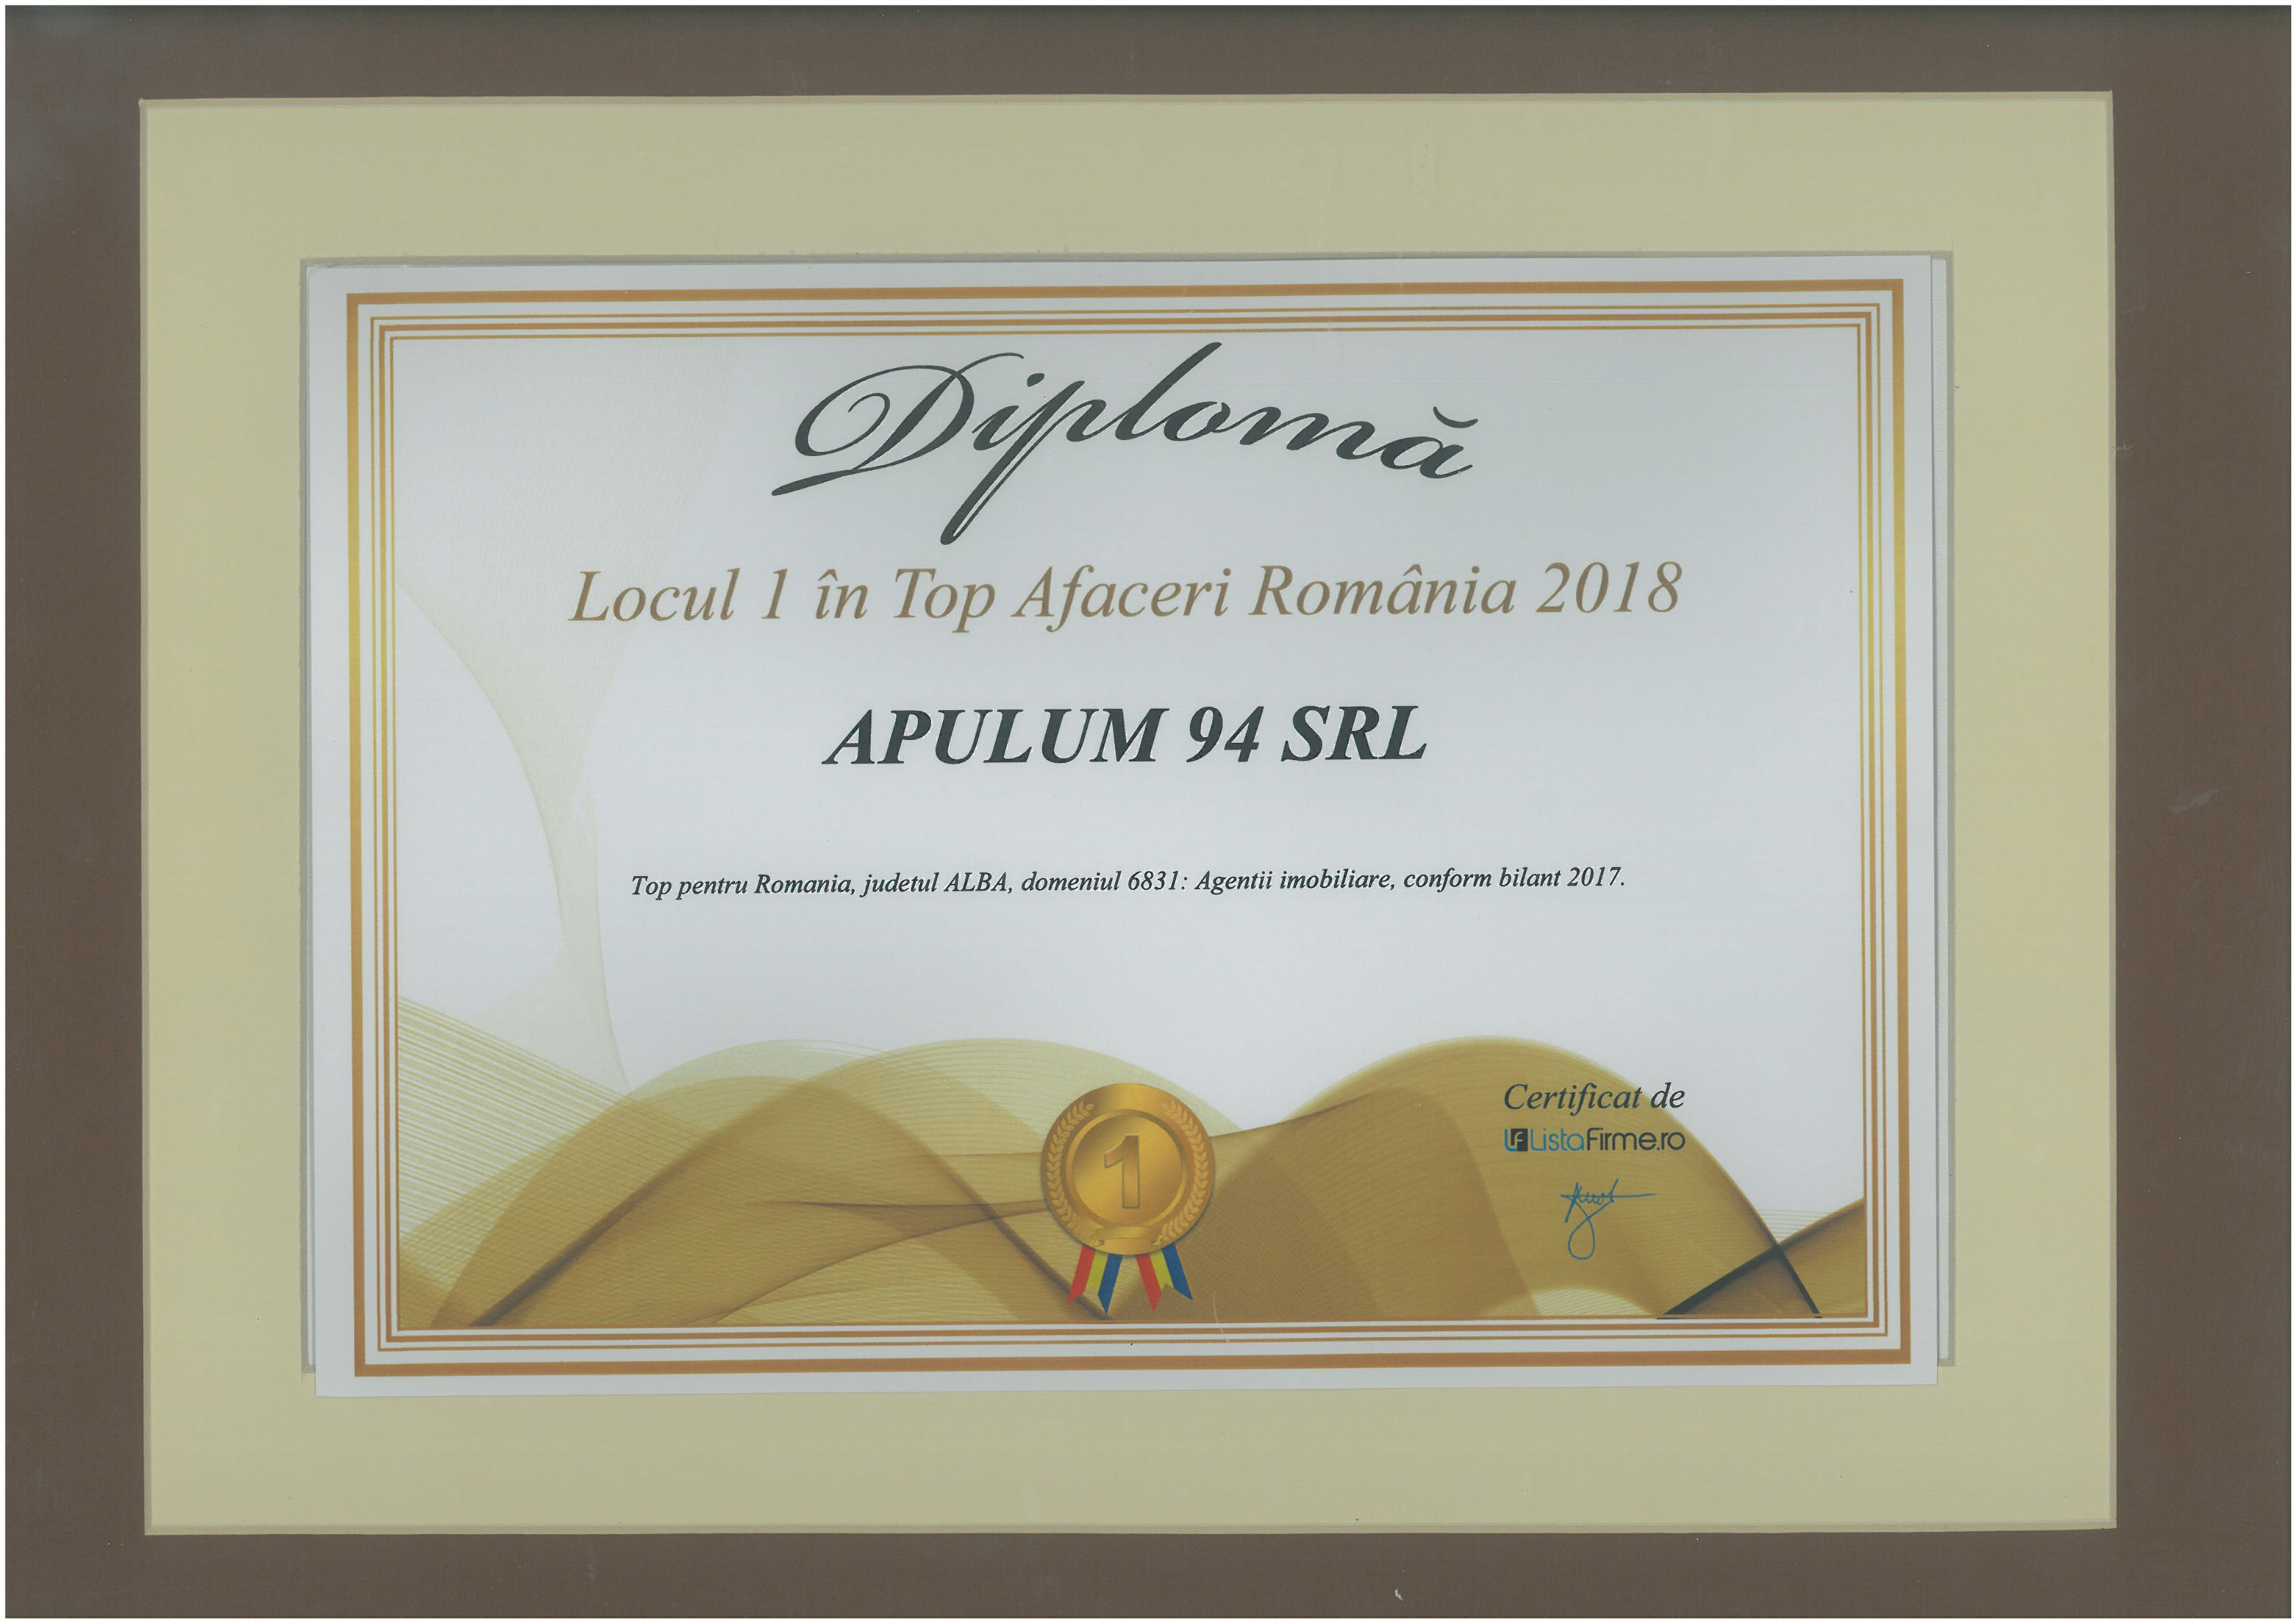 Top Afaceri Romania – 2018 - Locul 1 - jud. Alba